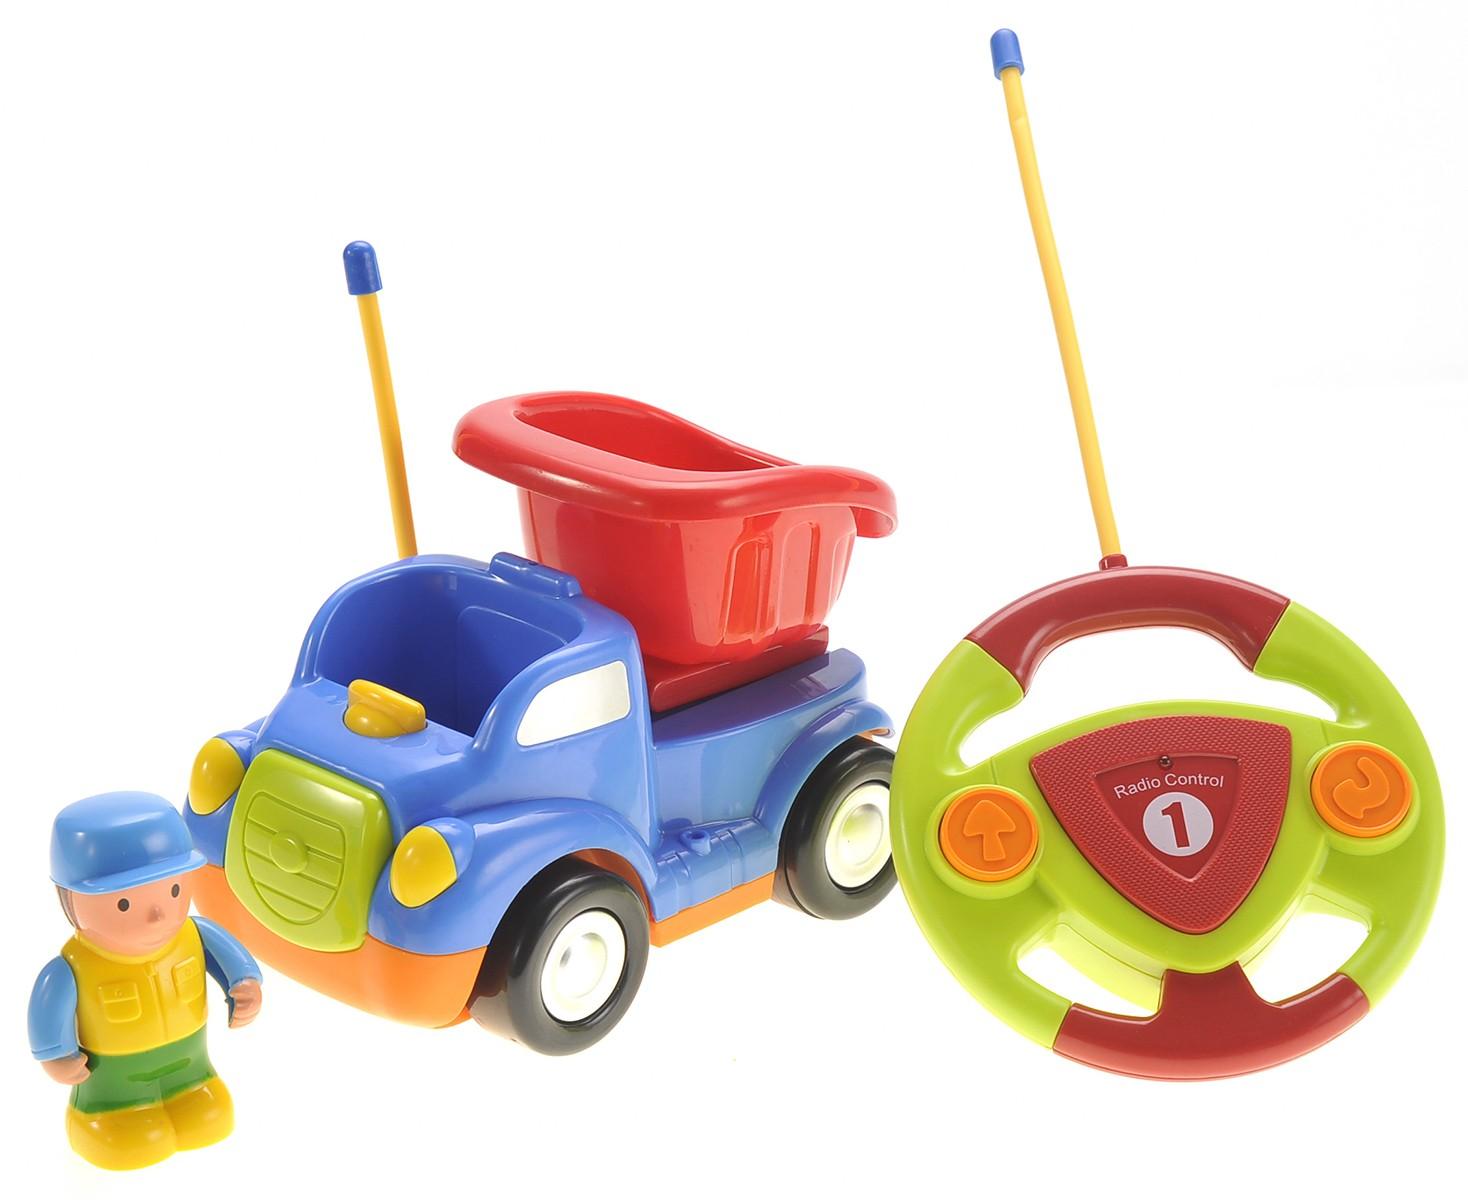 Cartoon R/C Construction Car for Kids Blue